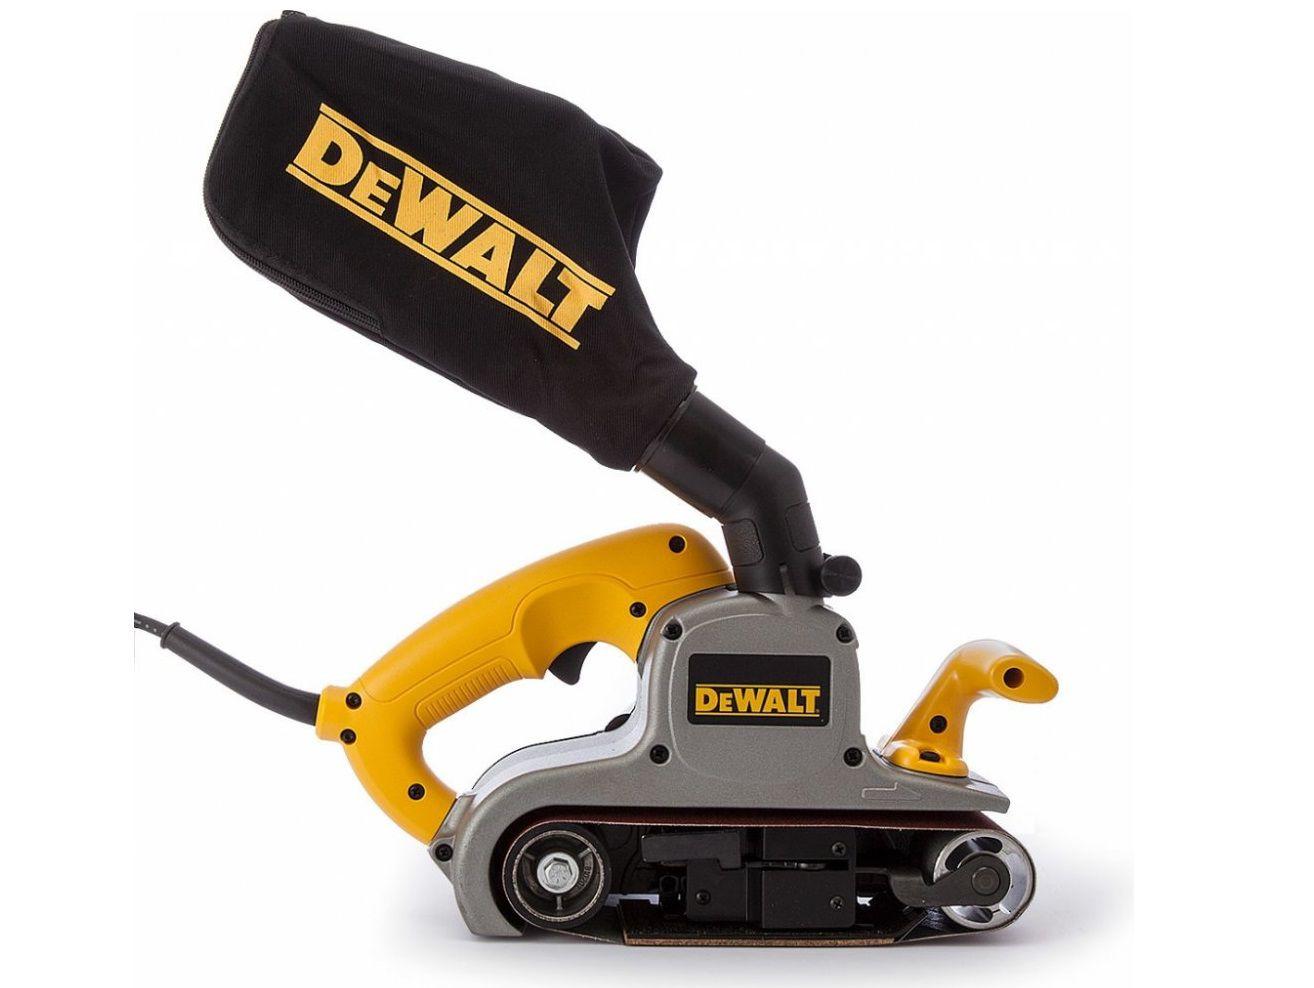 Pásová bruska DeWalt DWP352VS - 1010W, 75x533mm, 5.5kg (DWP352VS-QS)